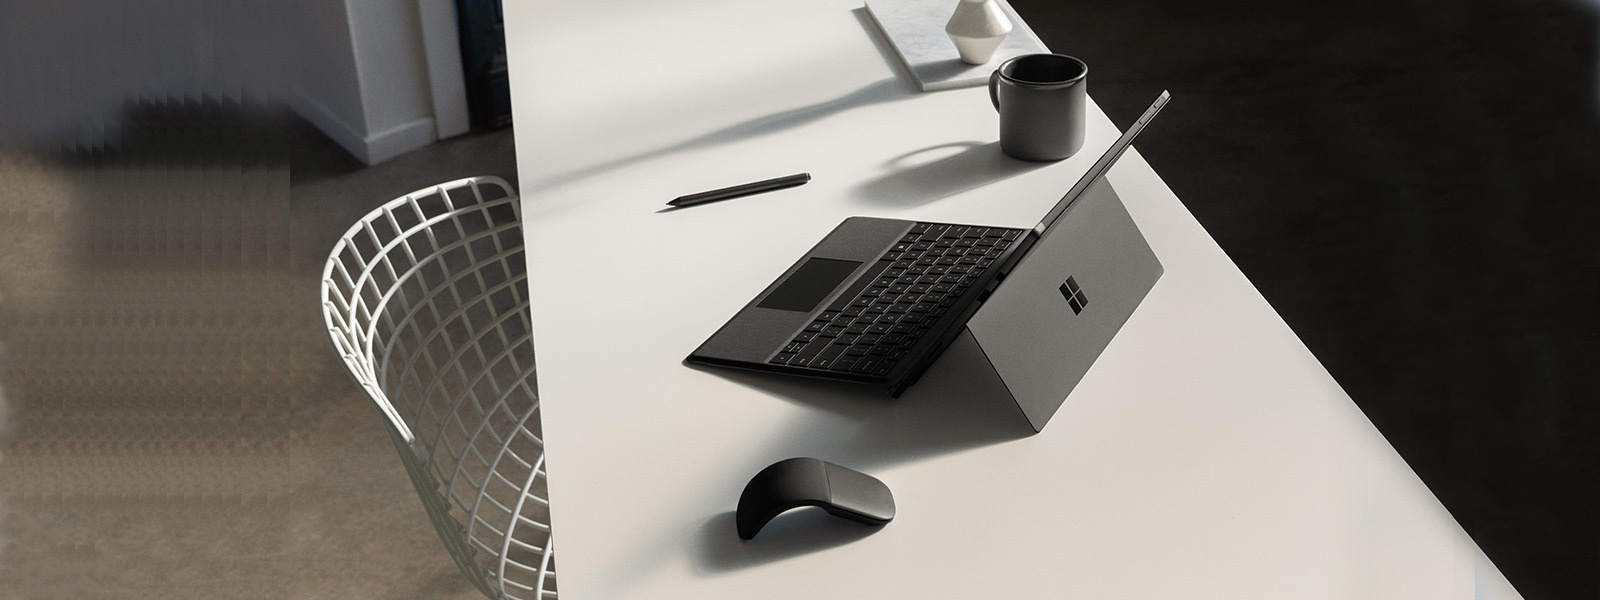 Surface Pro 6 på et skrivebord i bærbar PC-modus med Surface Pro Type Cover, Surface-penn og Surface Arc Mouse